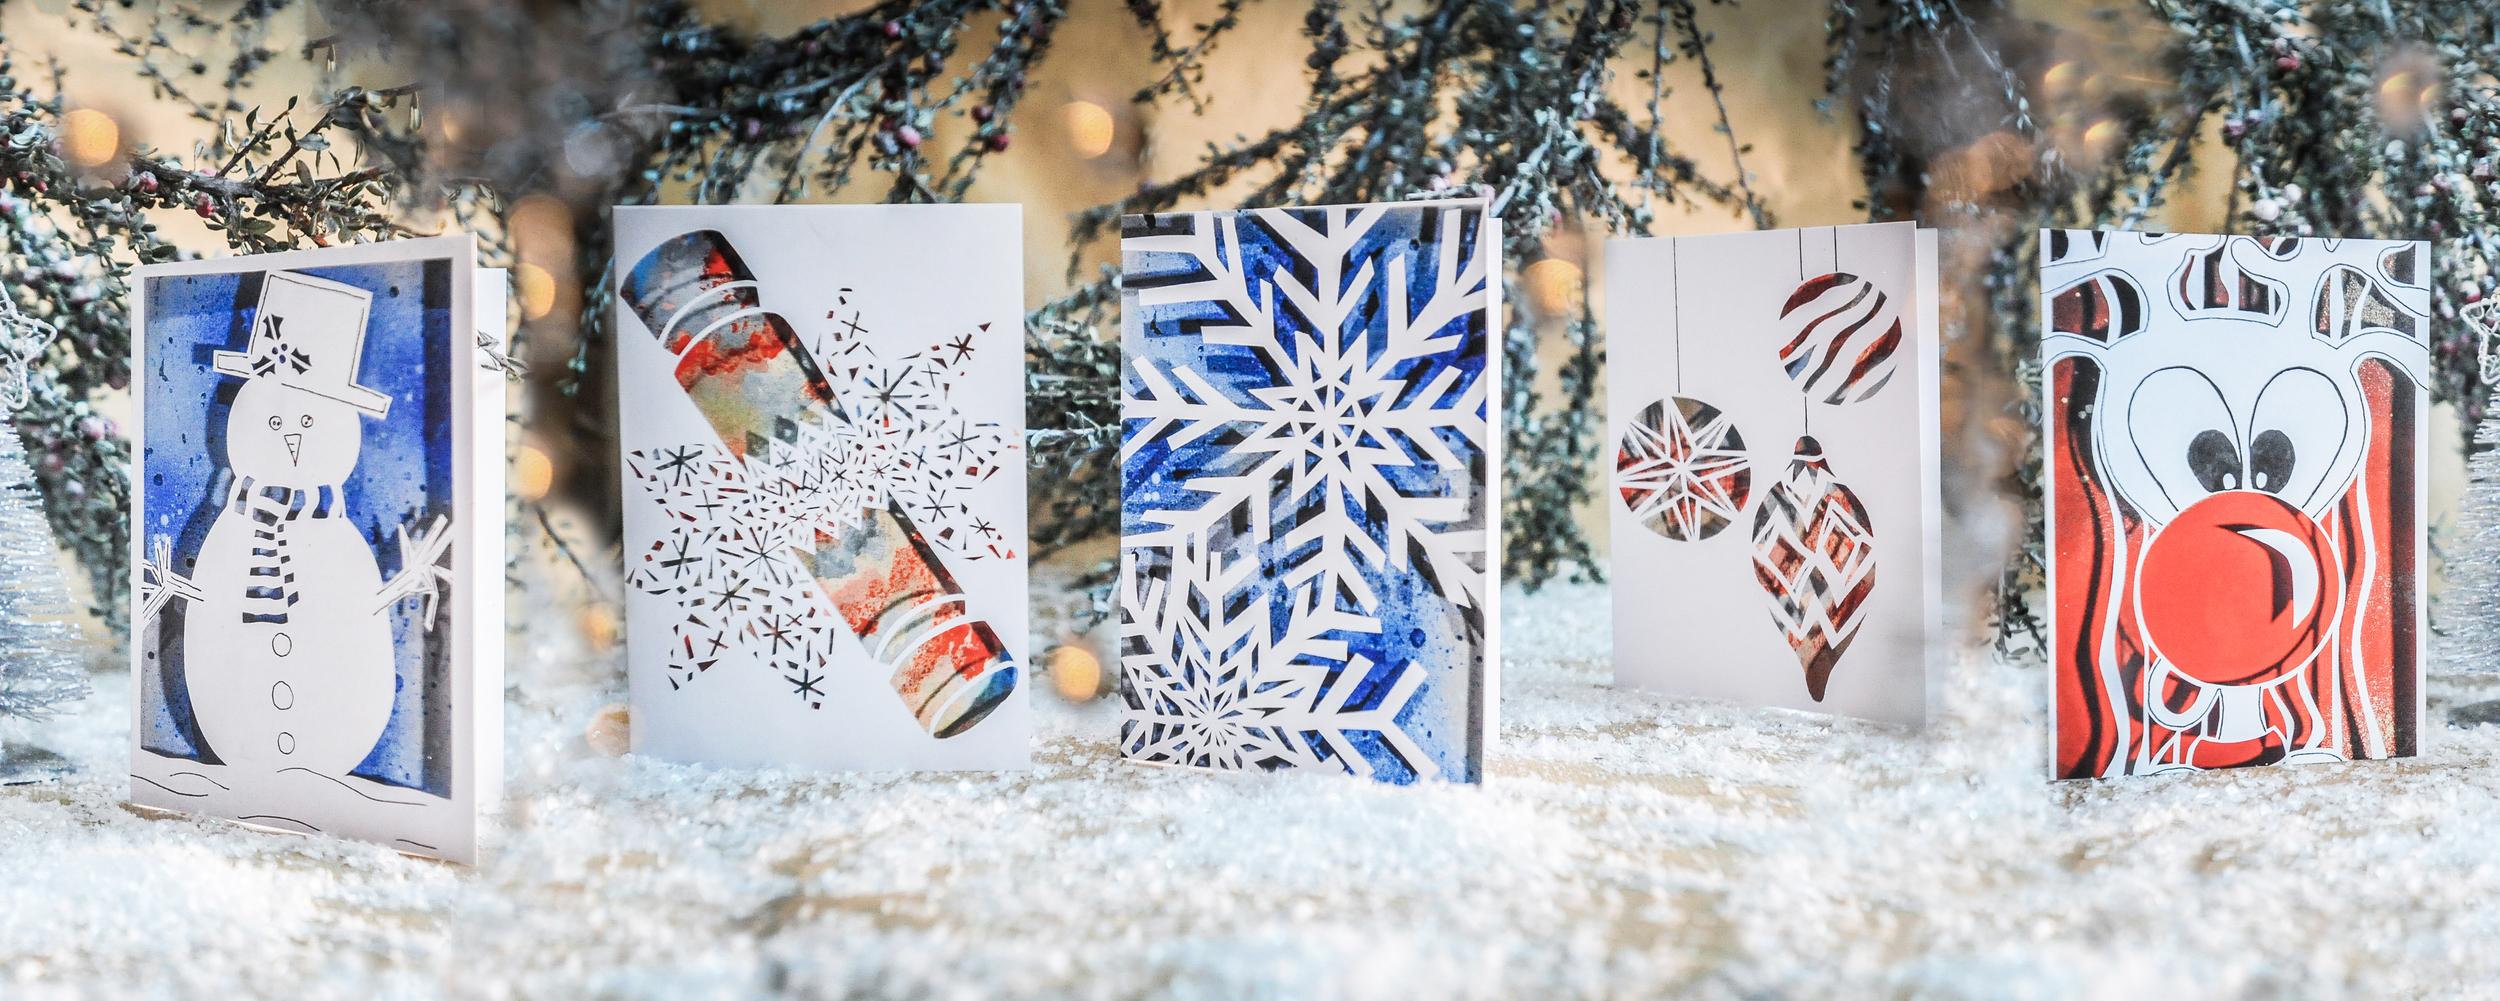 2014 Christmas Card Collection